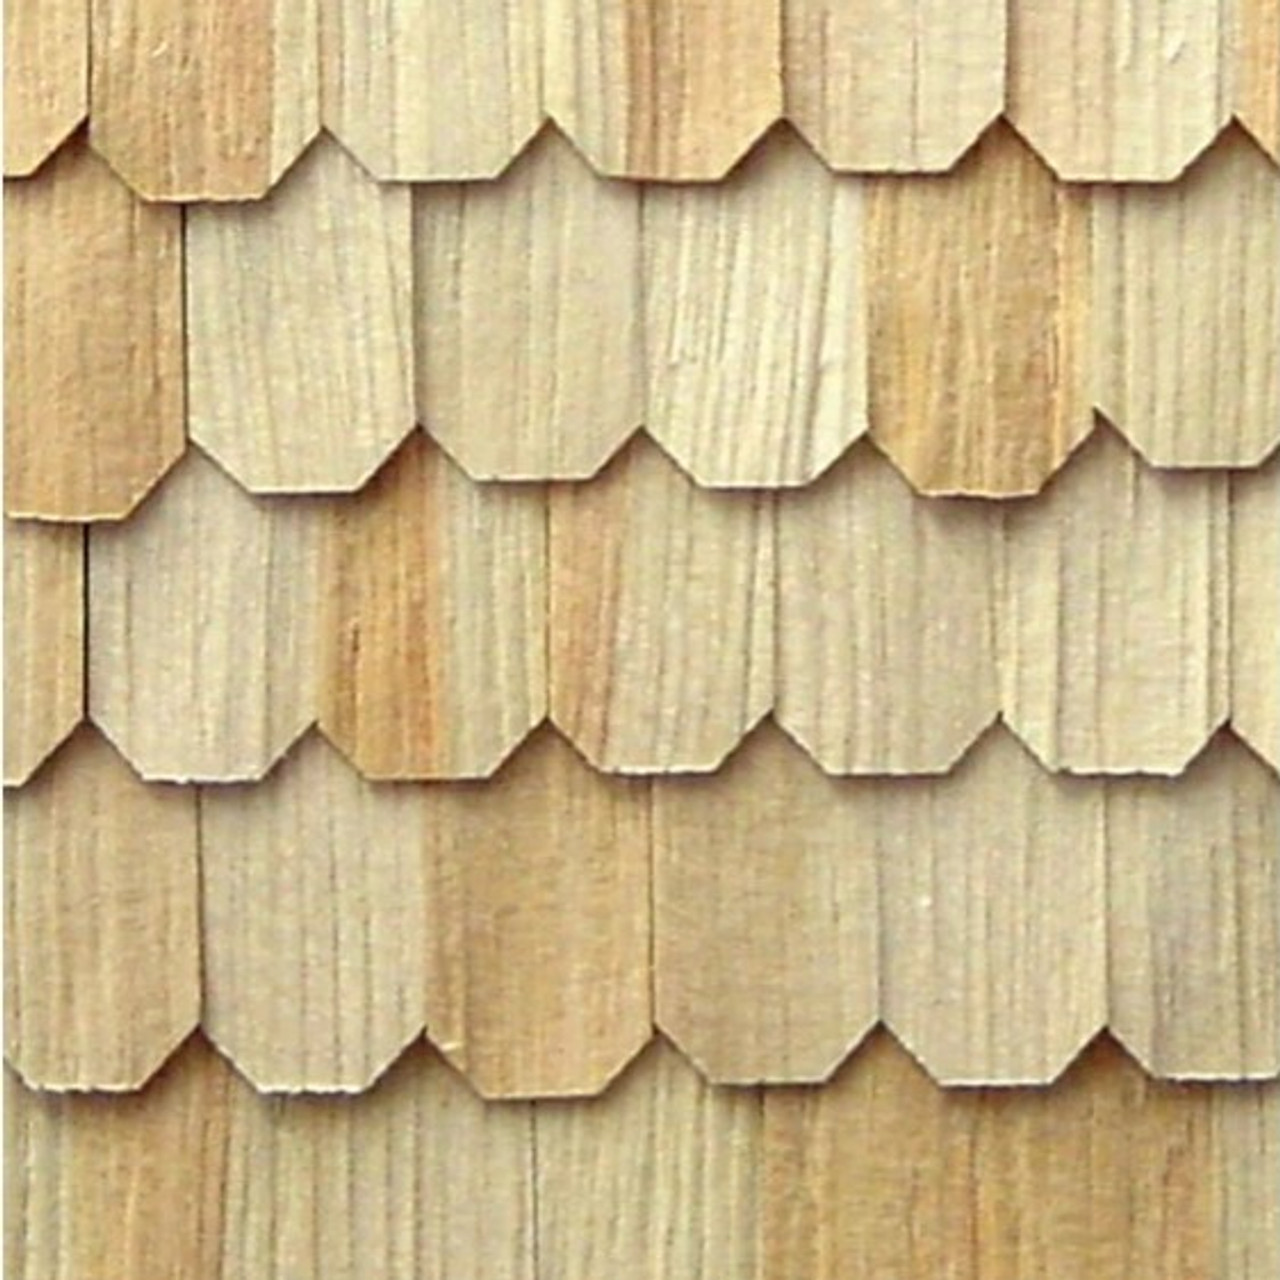 RGTSWO - Extra Long Pine Hexagon Shingles; installed section shown